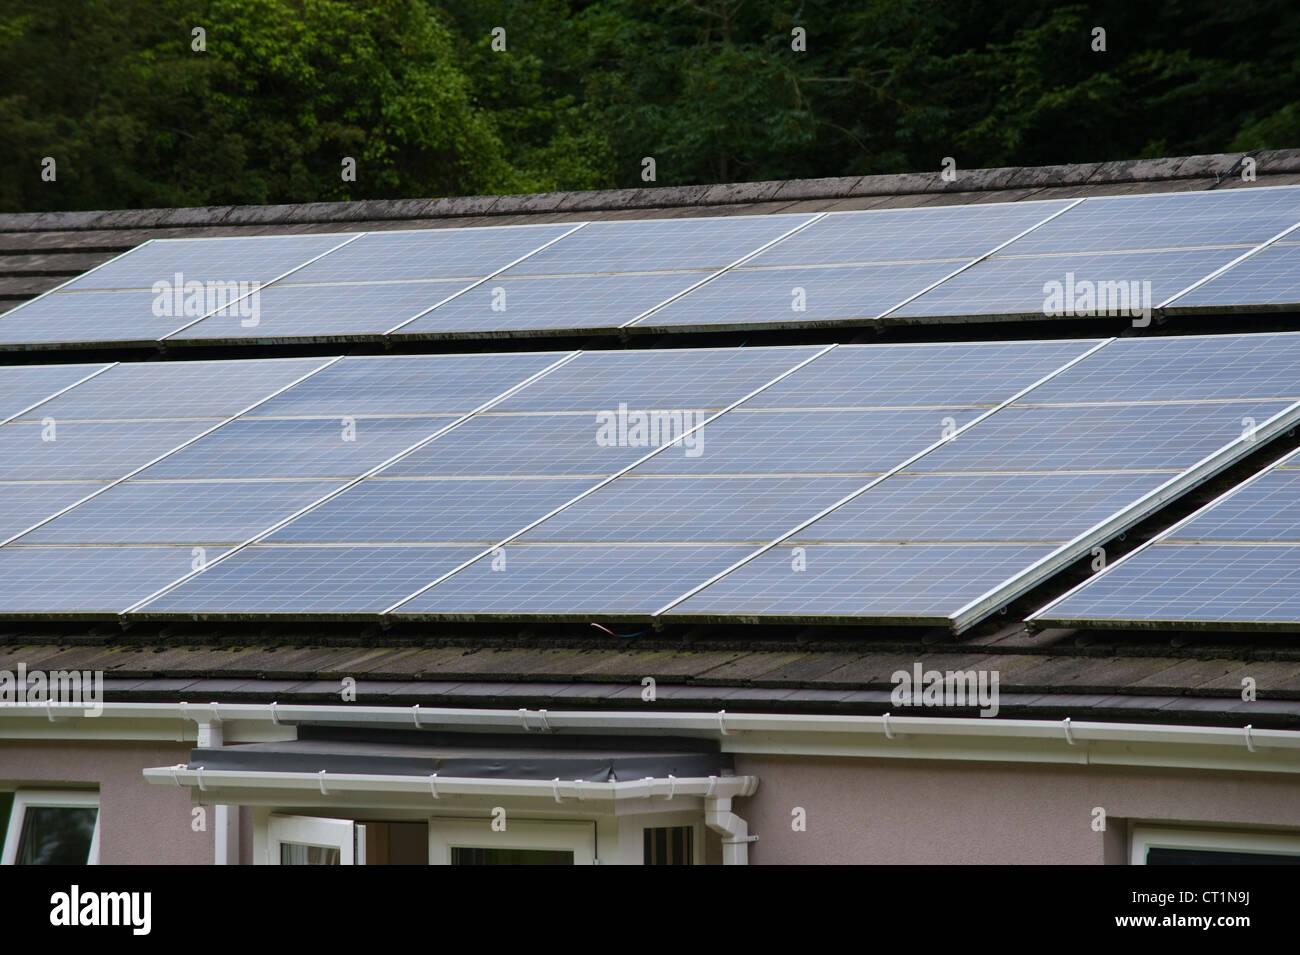 Solar panels on roof of senior citizen community housing at Pontnewynydd Pontypool Torfaen Gwent South Wales UK - Stock Image